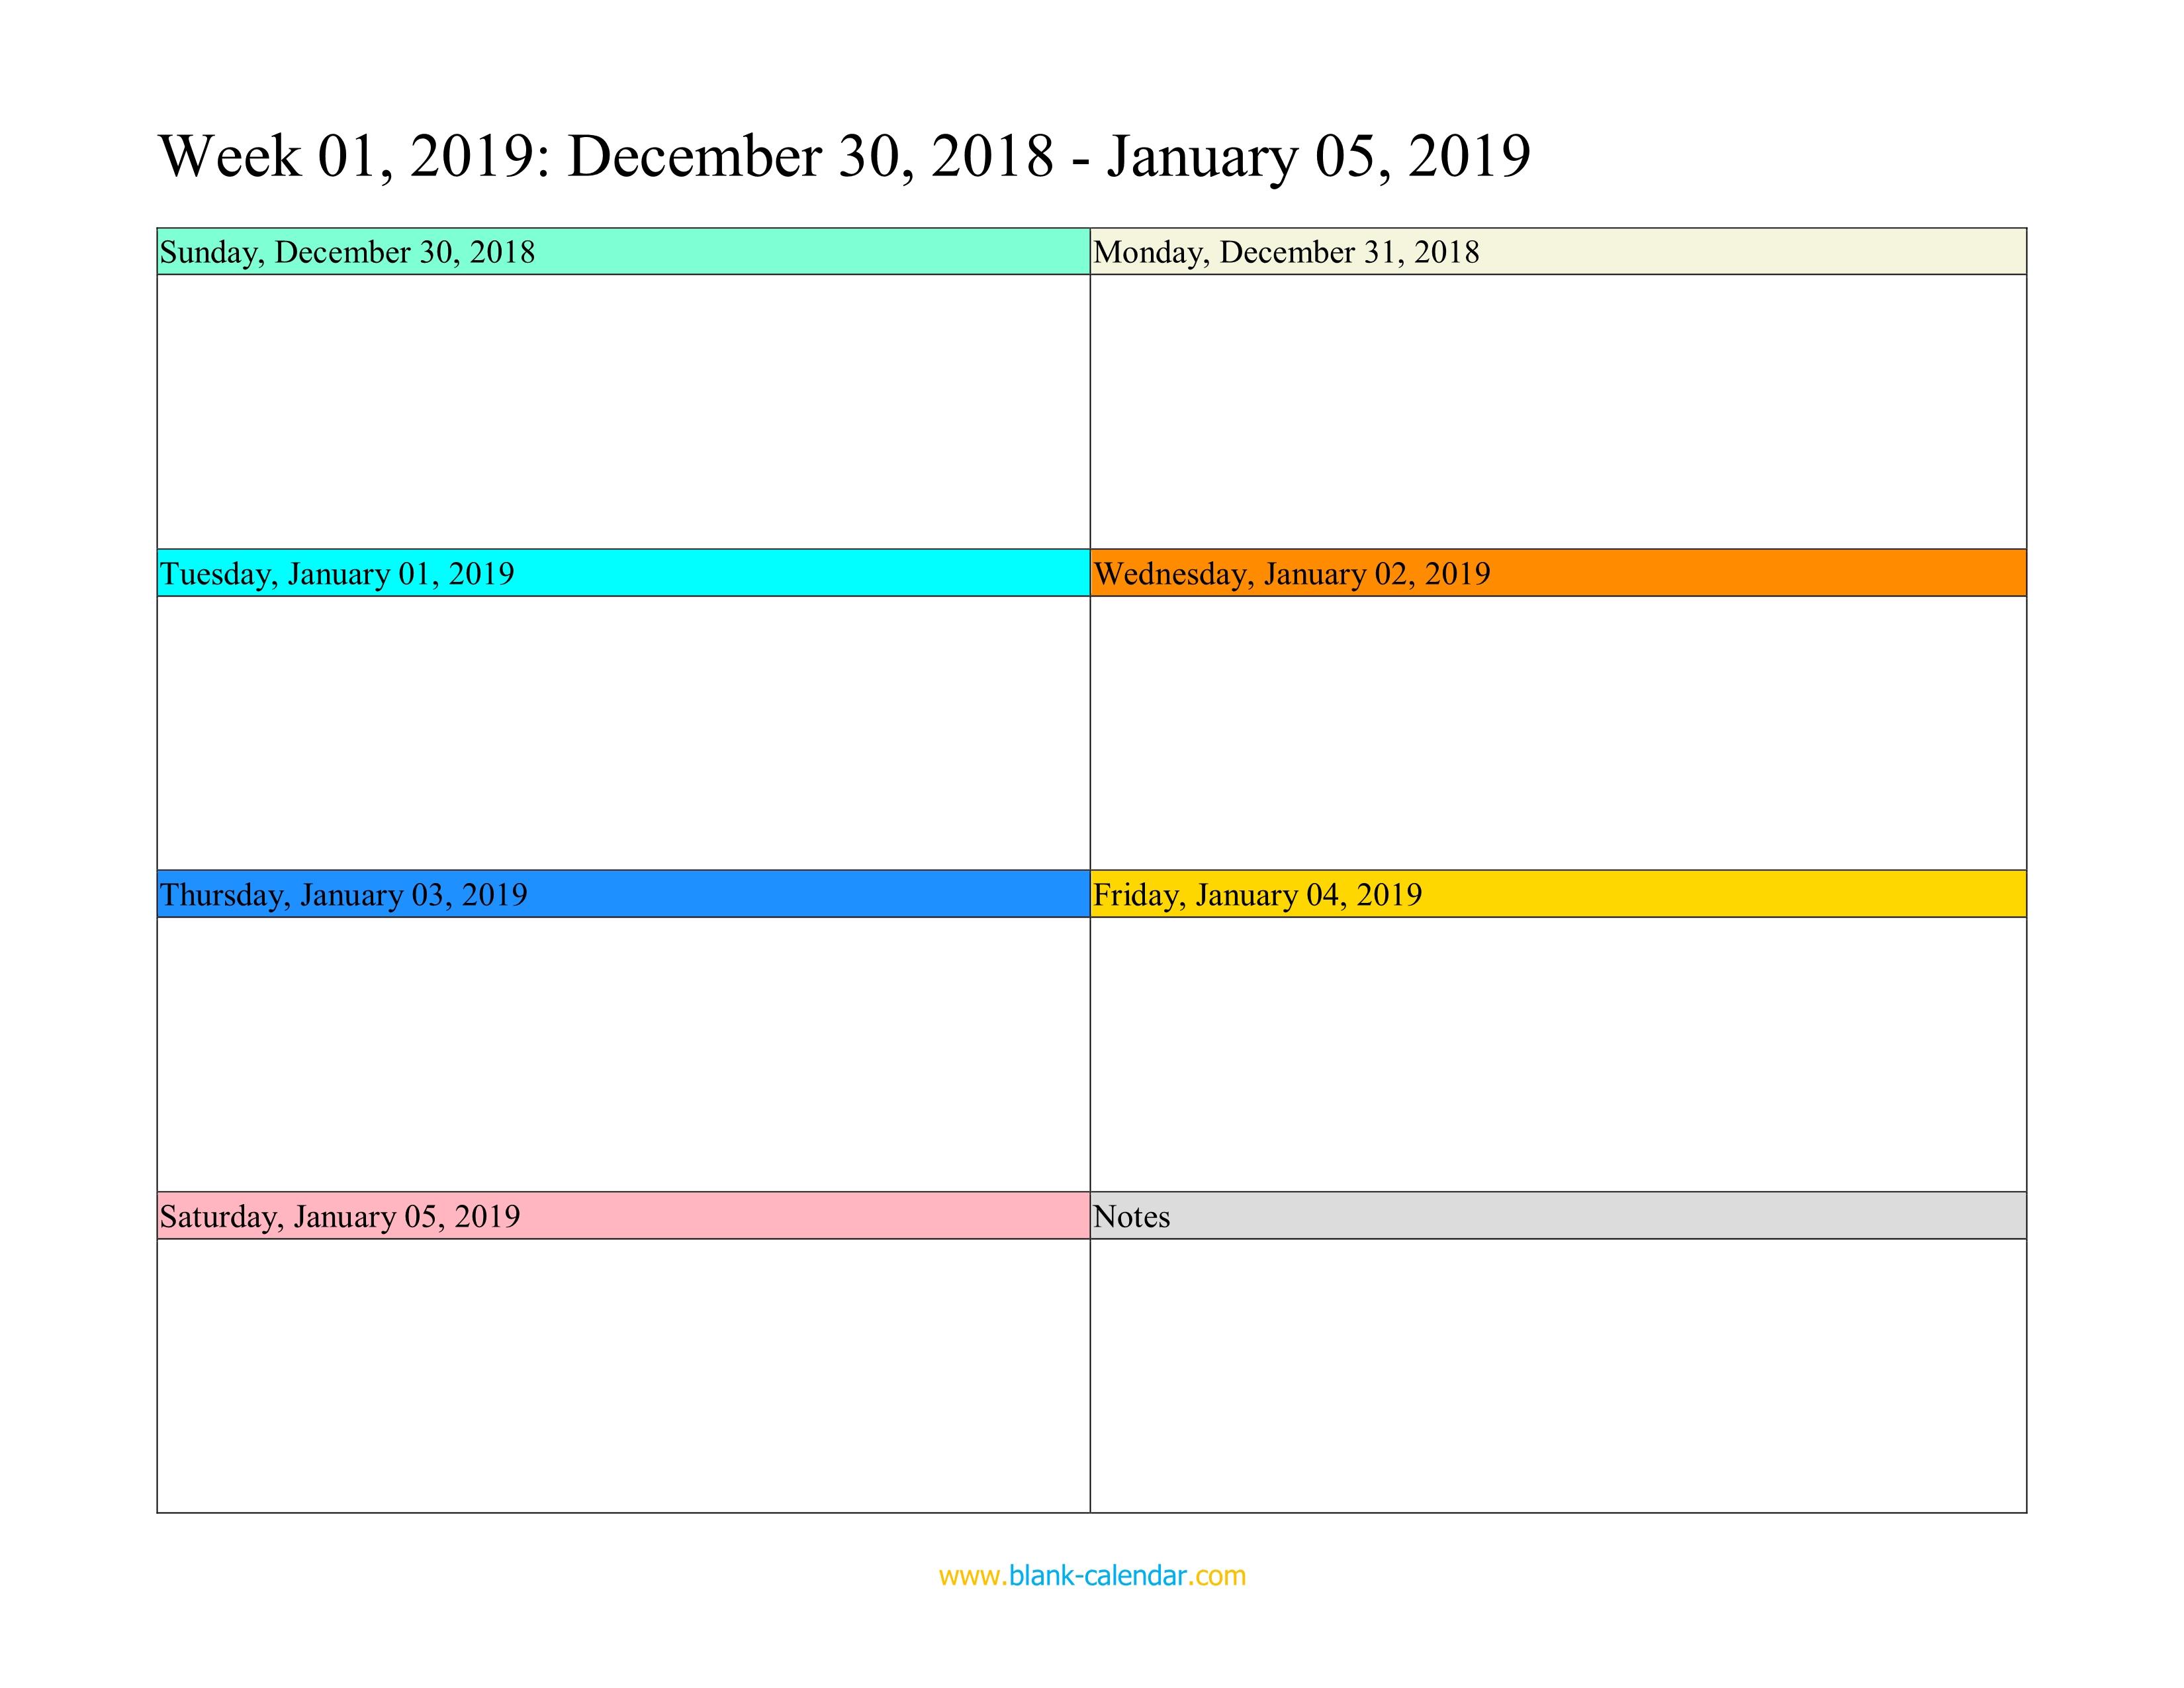 Print Blank Weekly Calendar Schedule Template Outlook   Smorad within Printable Blank Weekly Calendars Templates